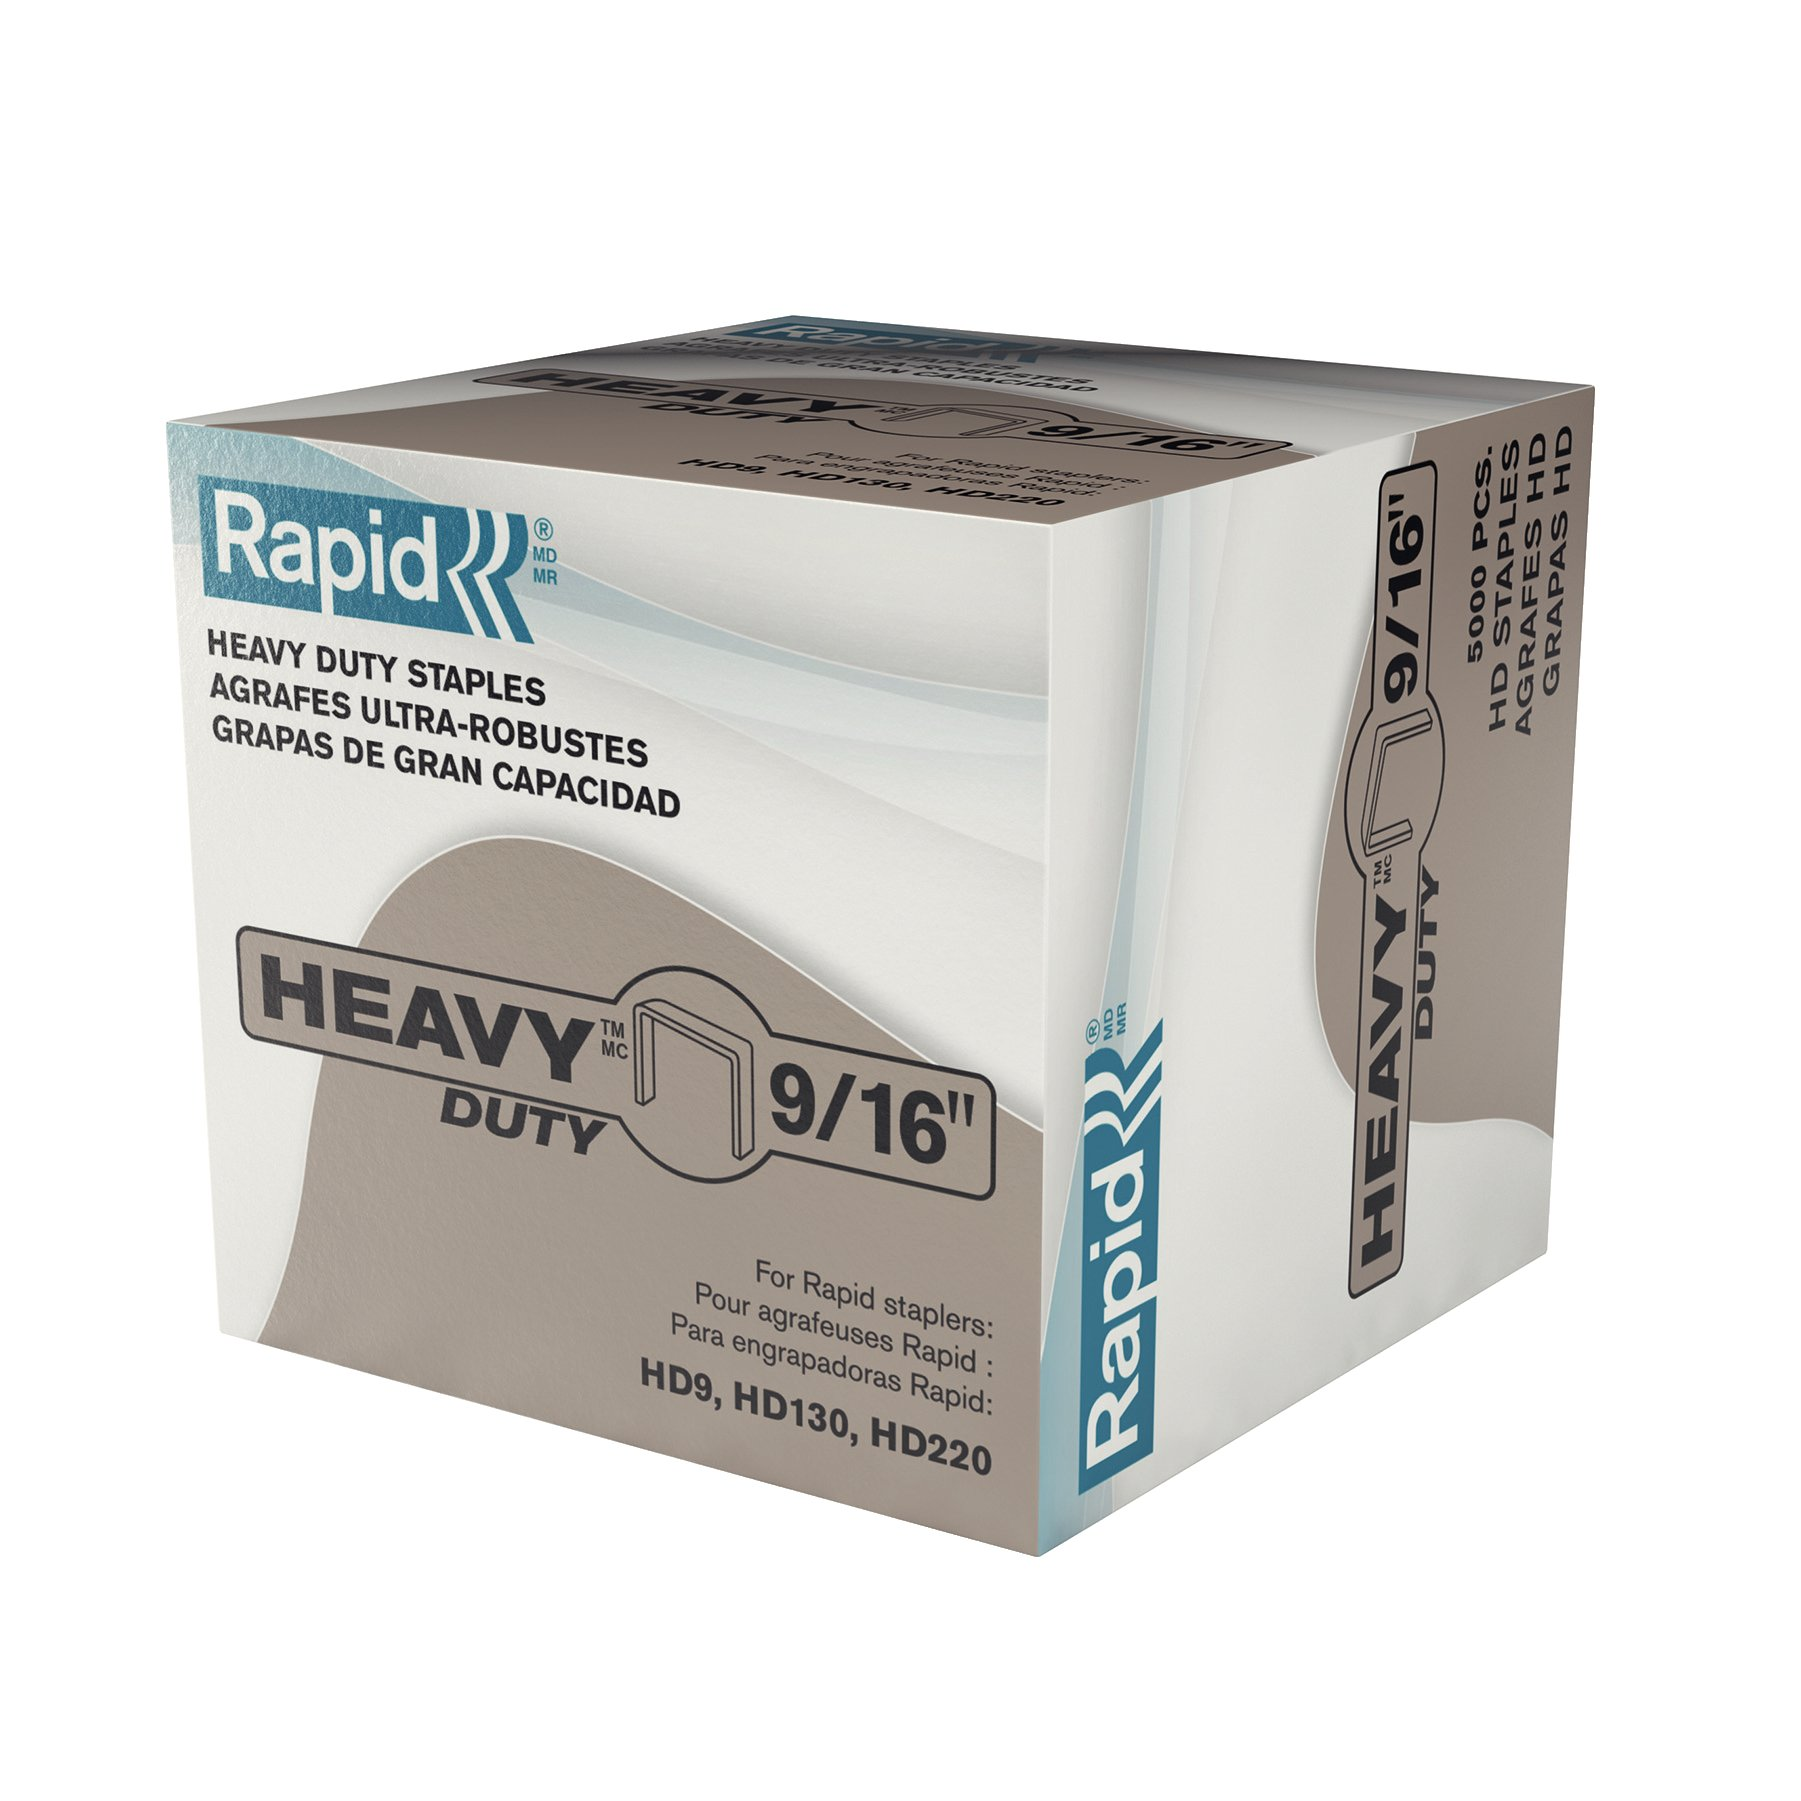 Rapid Heavy Duty 9/16'' Staples - 5,000 box (9051)